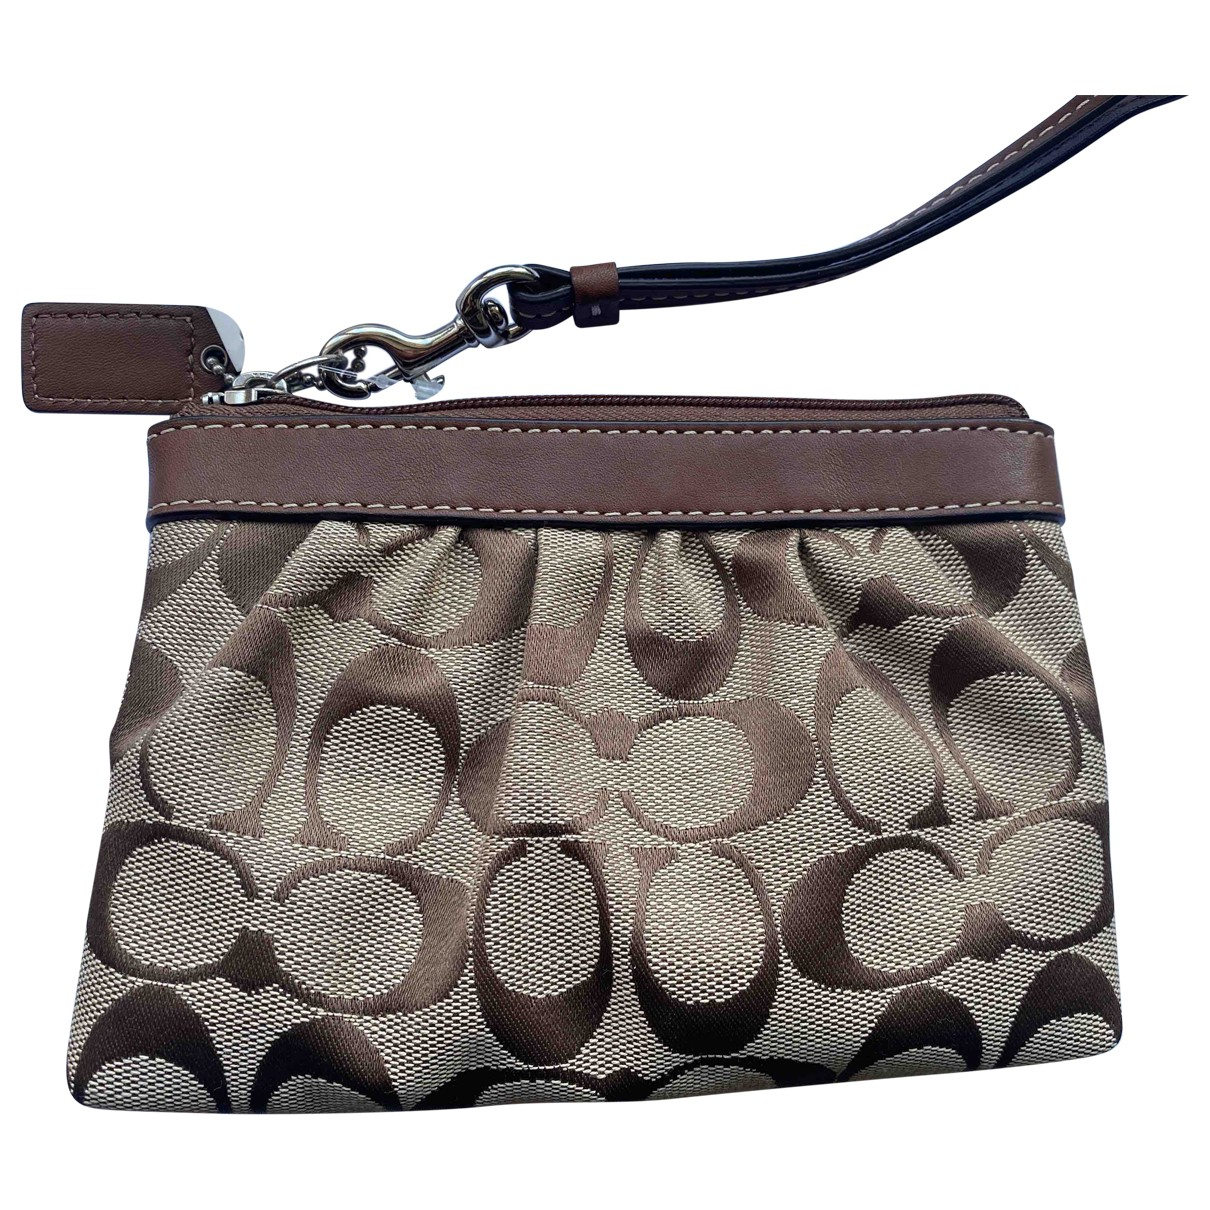 Coach \N Brown Leather Clutch bag for Women \N